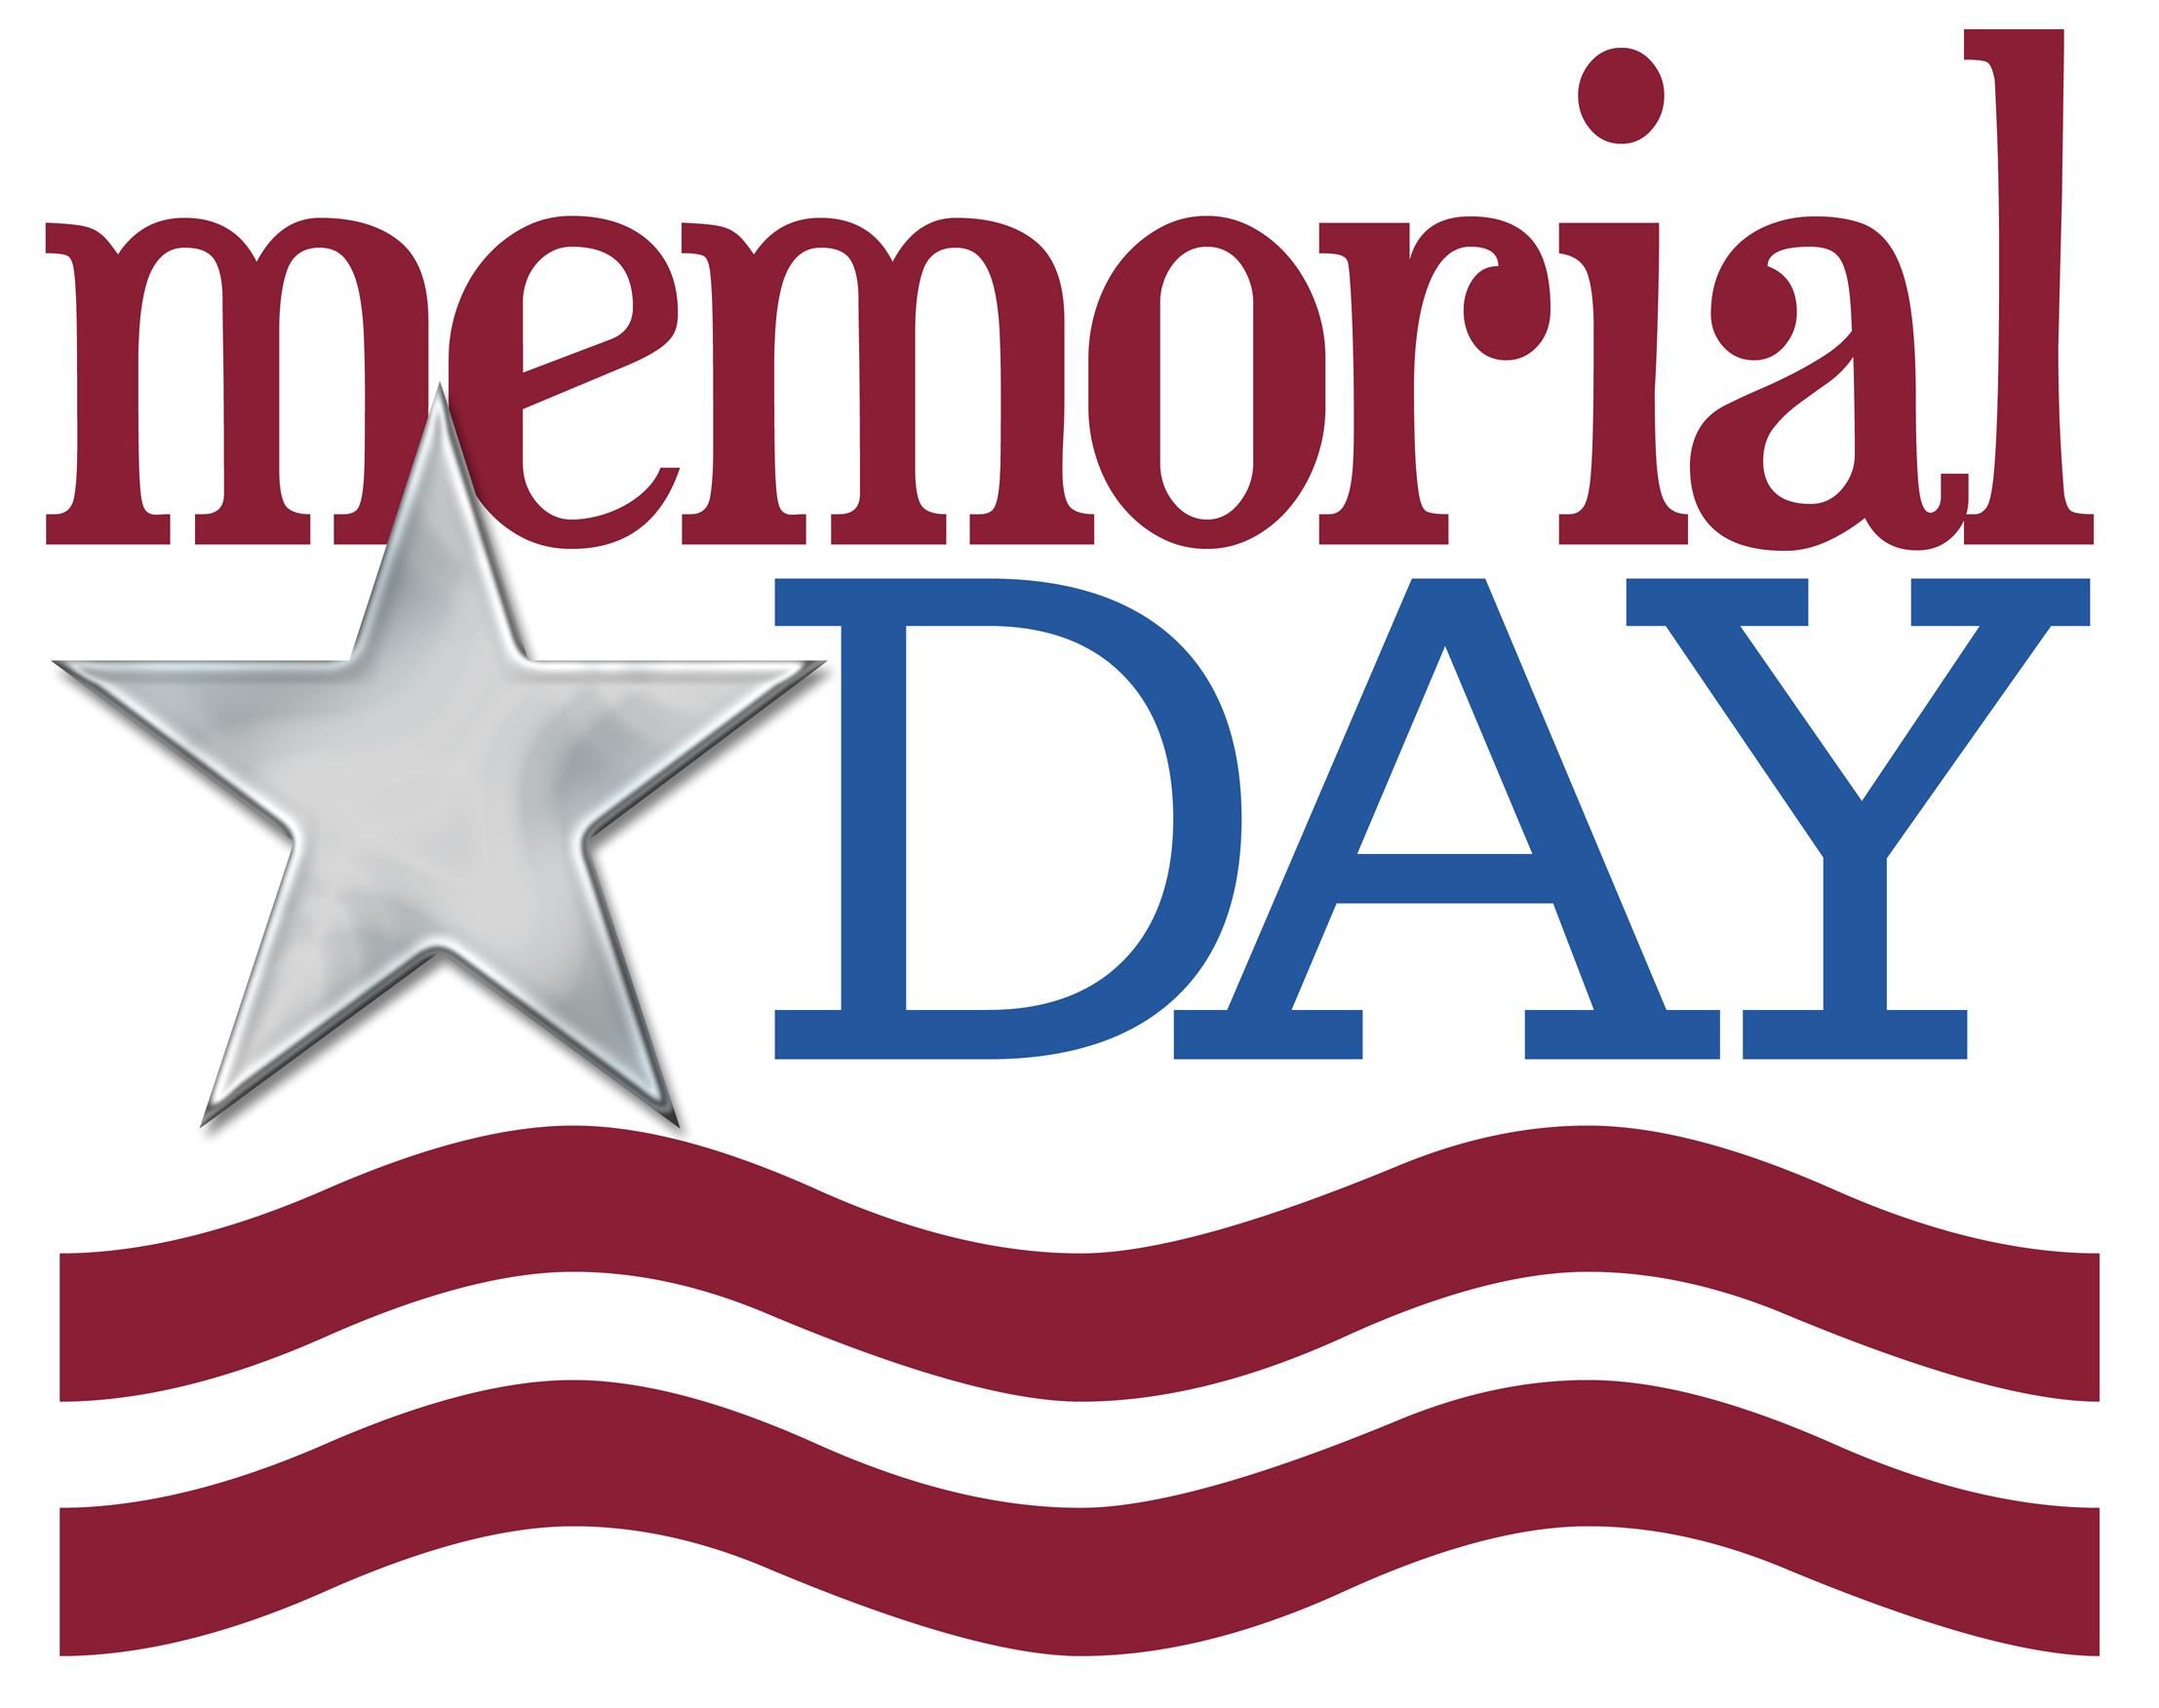 Memorial Day 2020 Clip Art 2214x1752